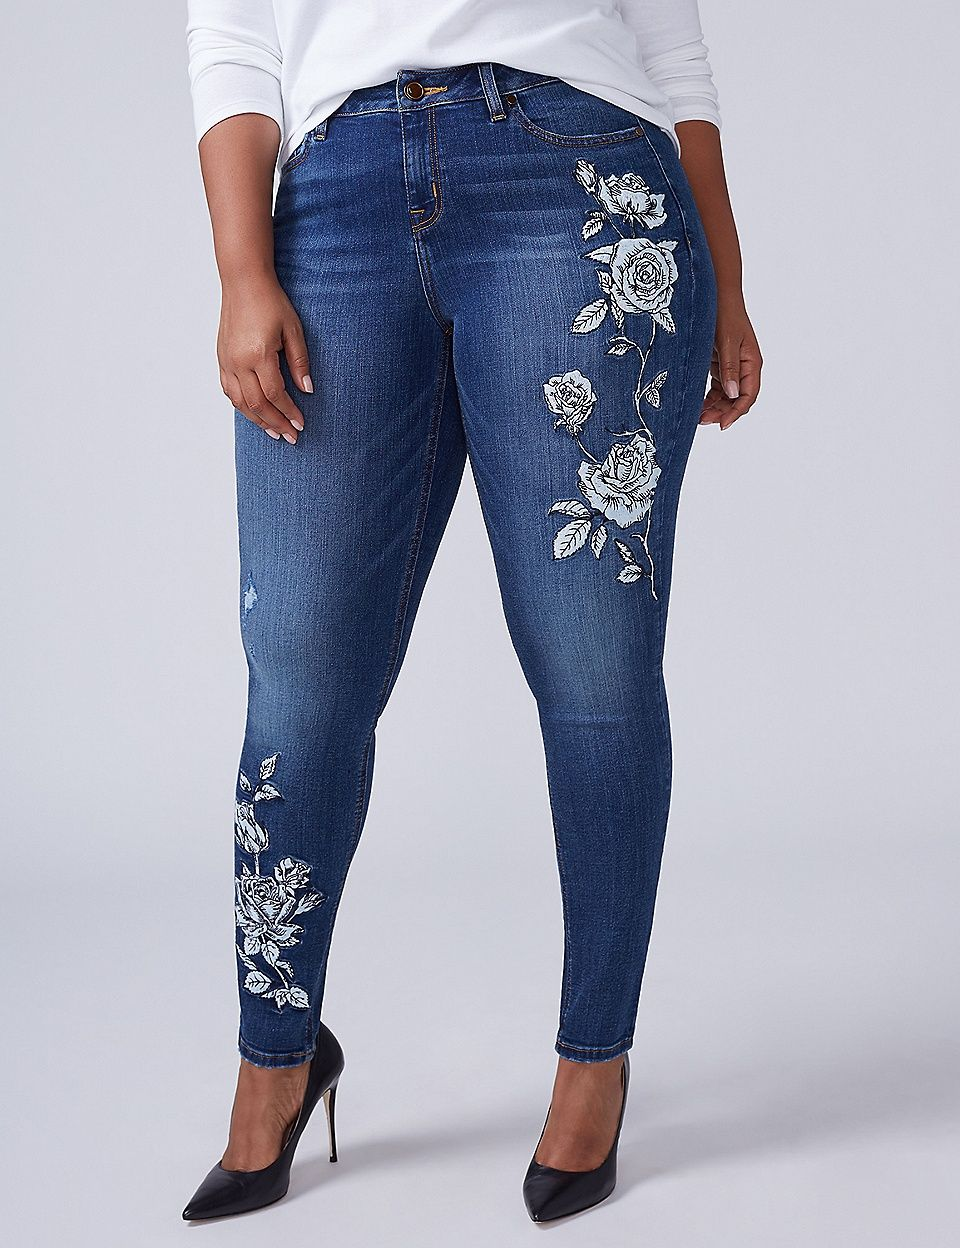 d5e693bb01e Super Stretch Skinny Jean - Floral Embroidery